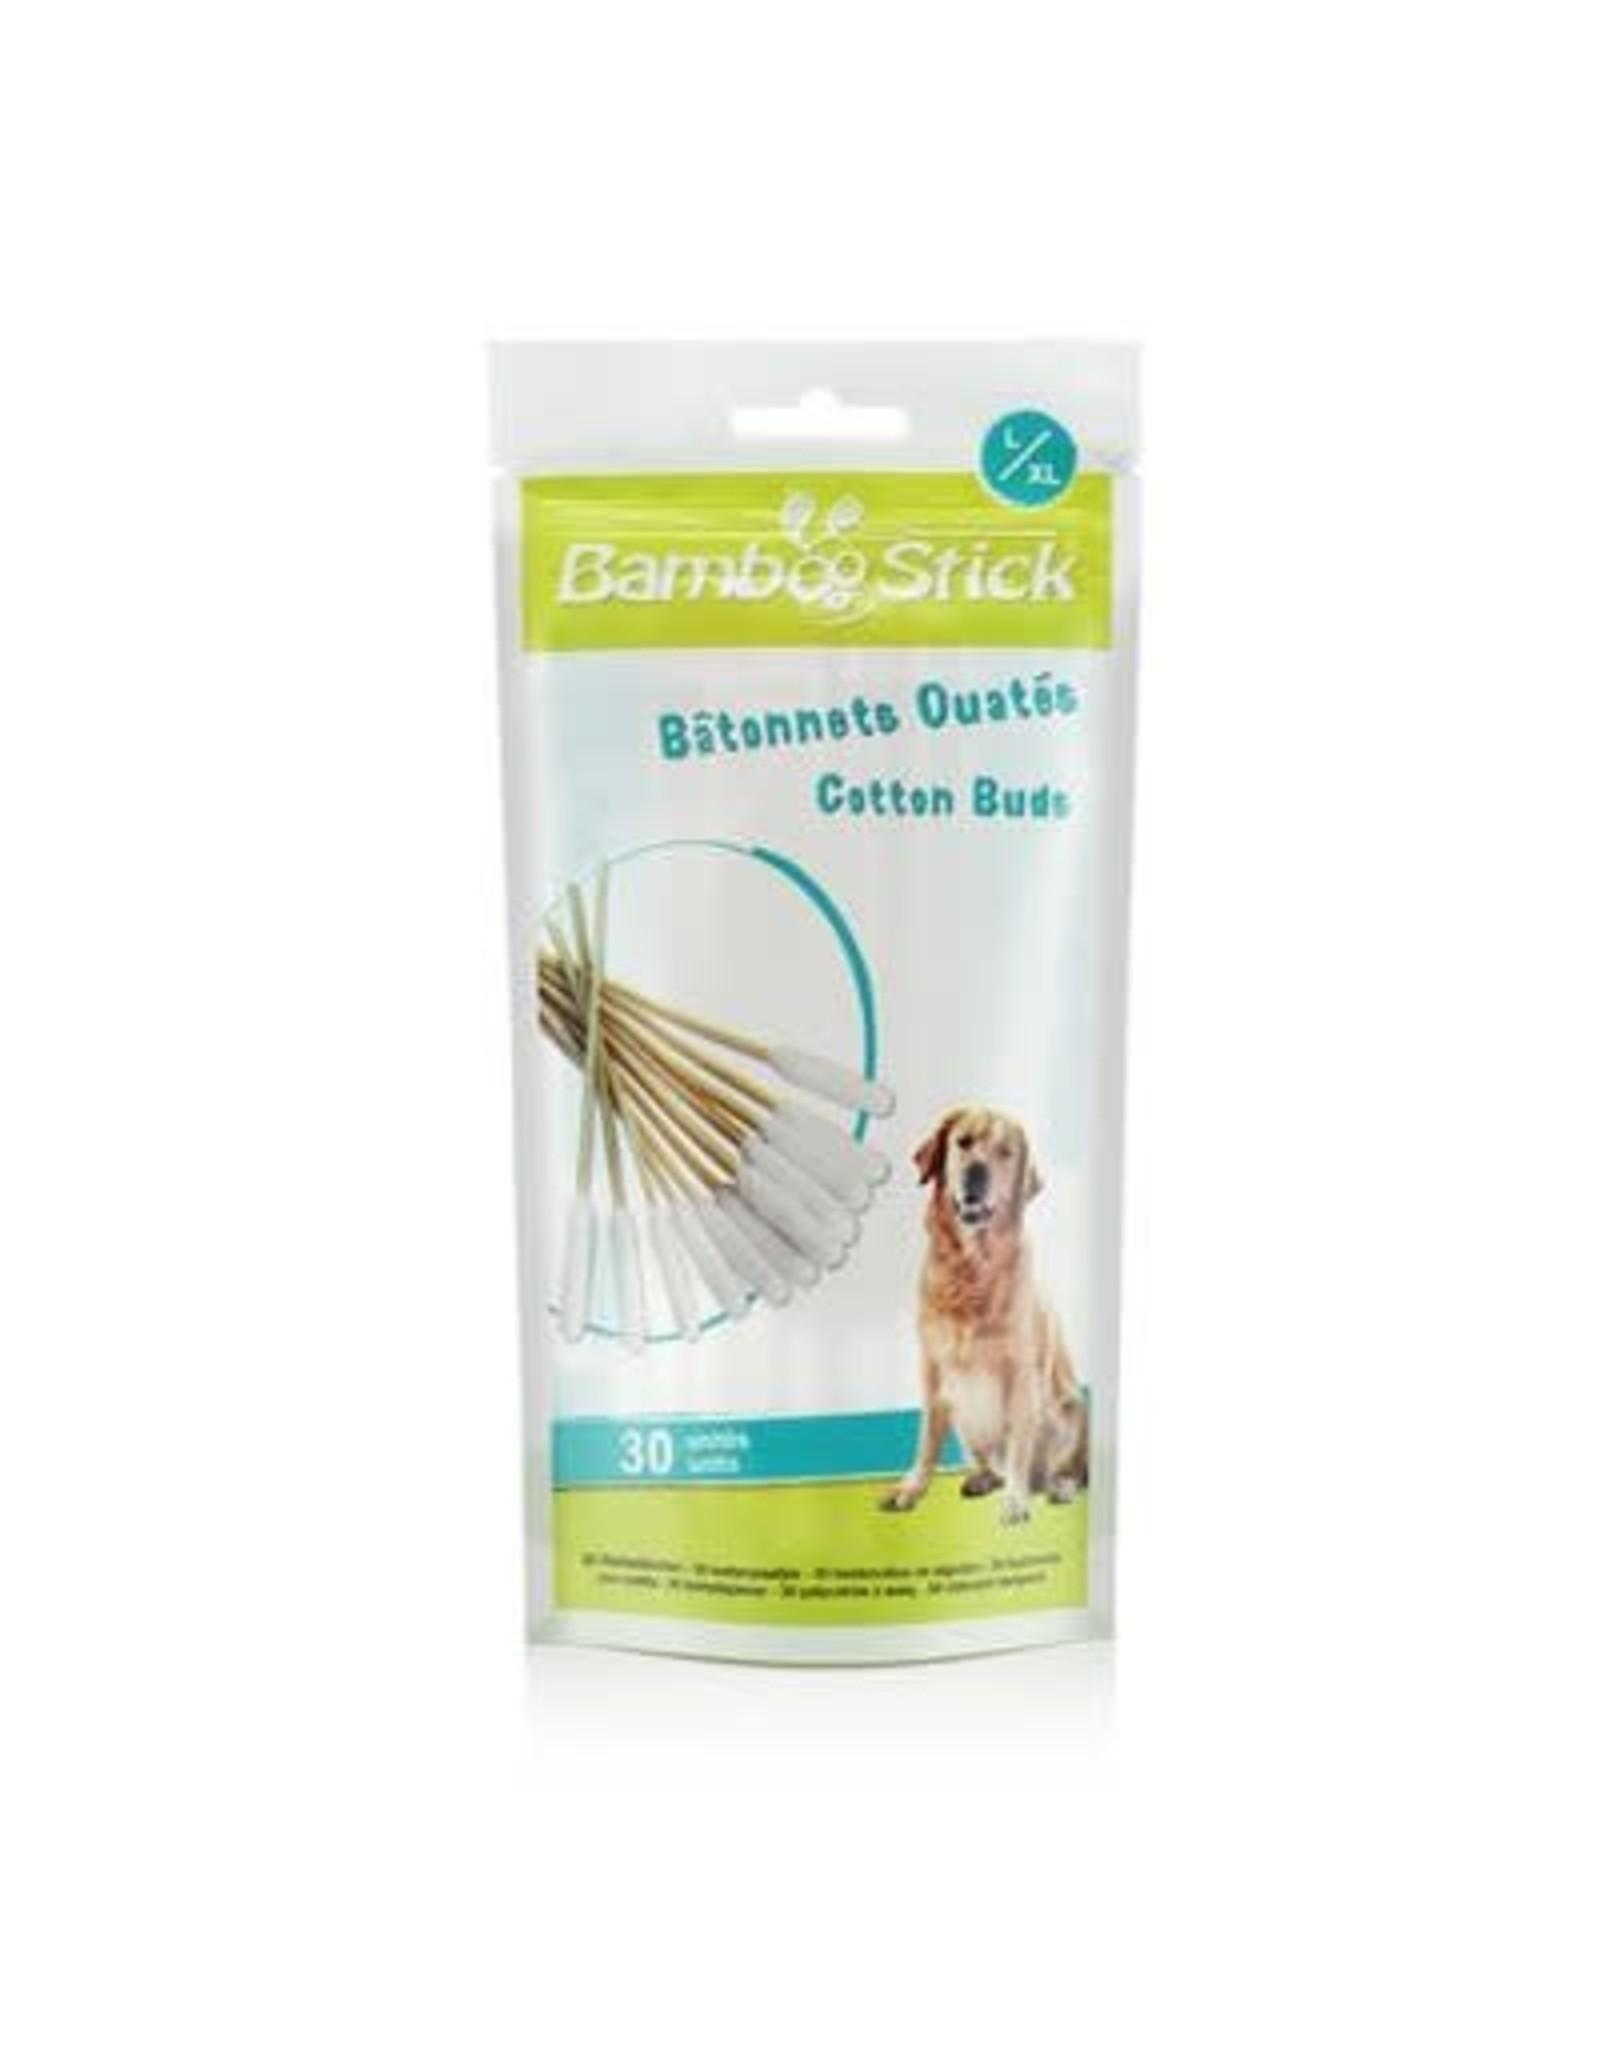 TickTwister BambooStick Cotton Buds Lg/XLg 30pk